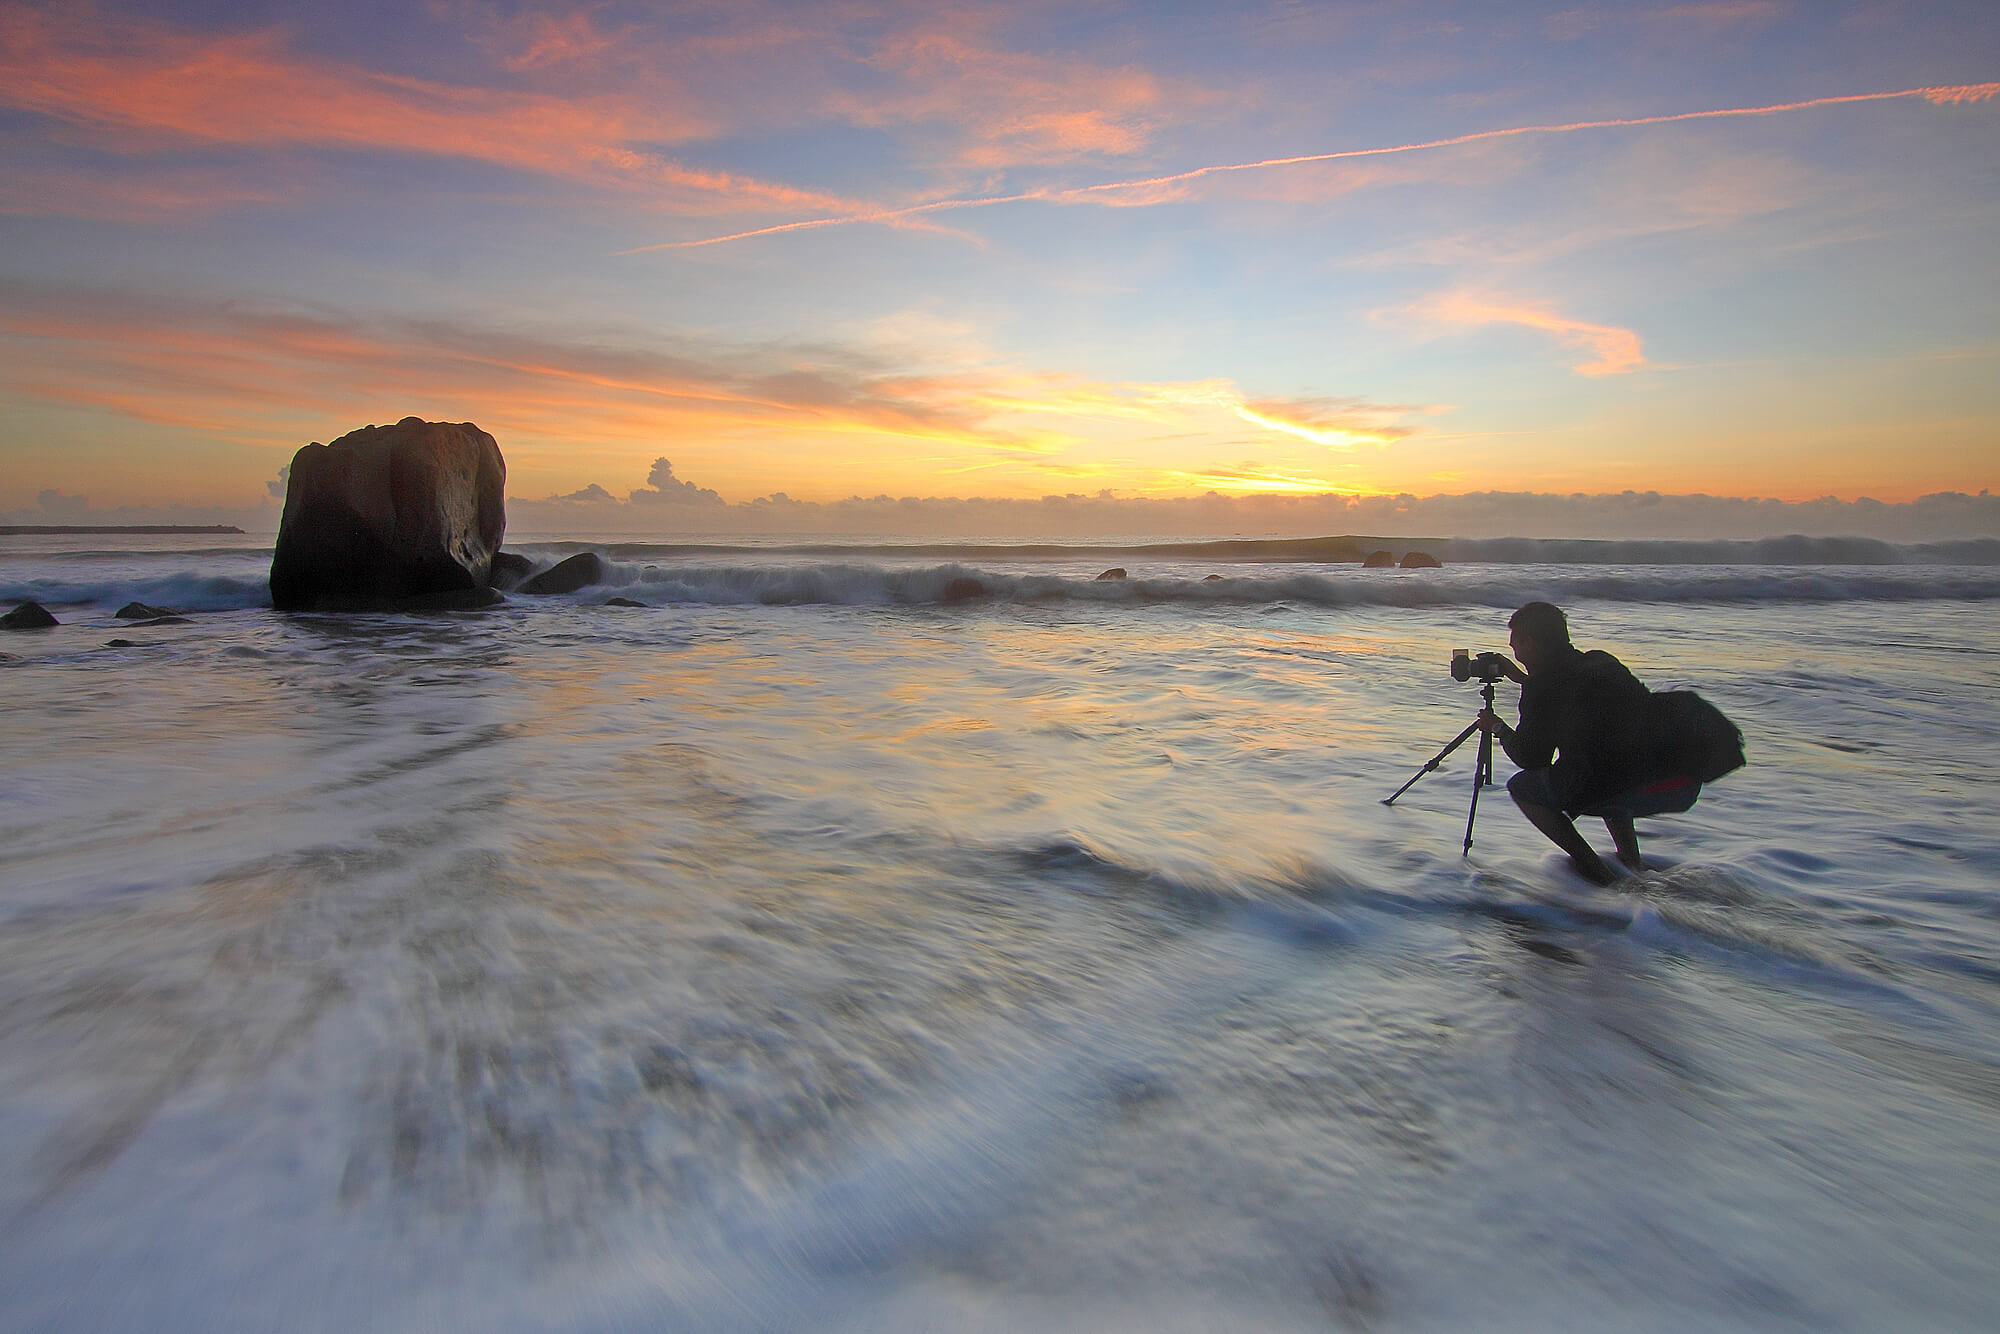 fotografas-peizazas-jura-apsvietimas-saulelydis